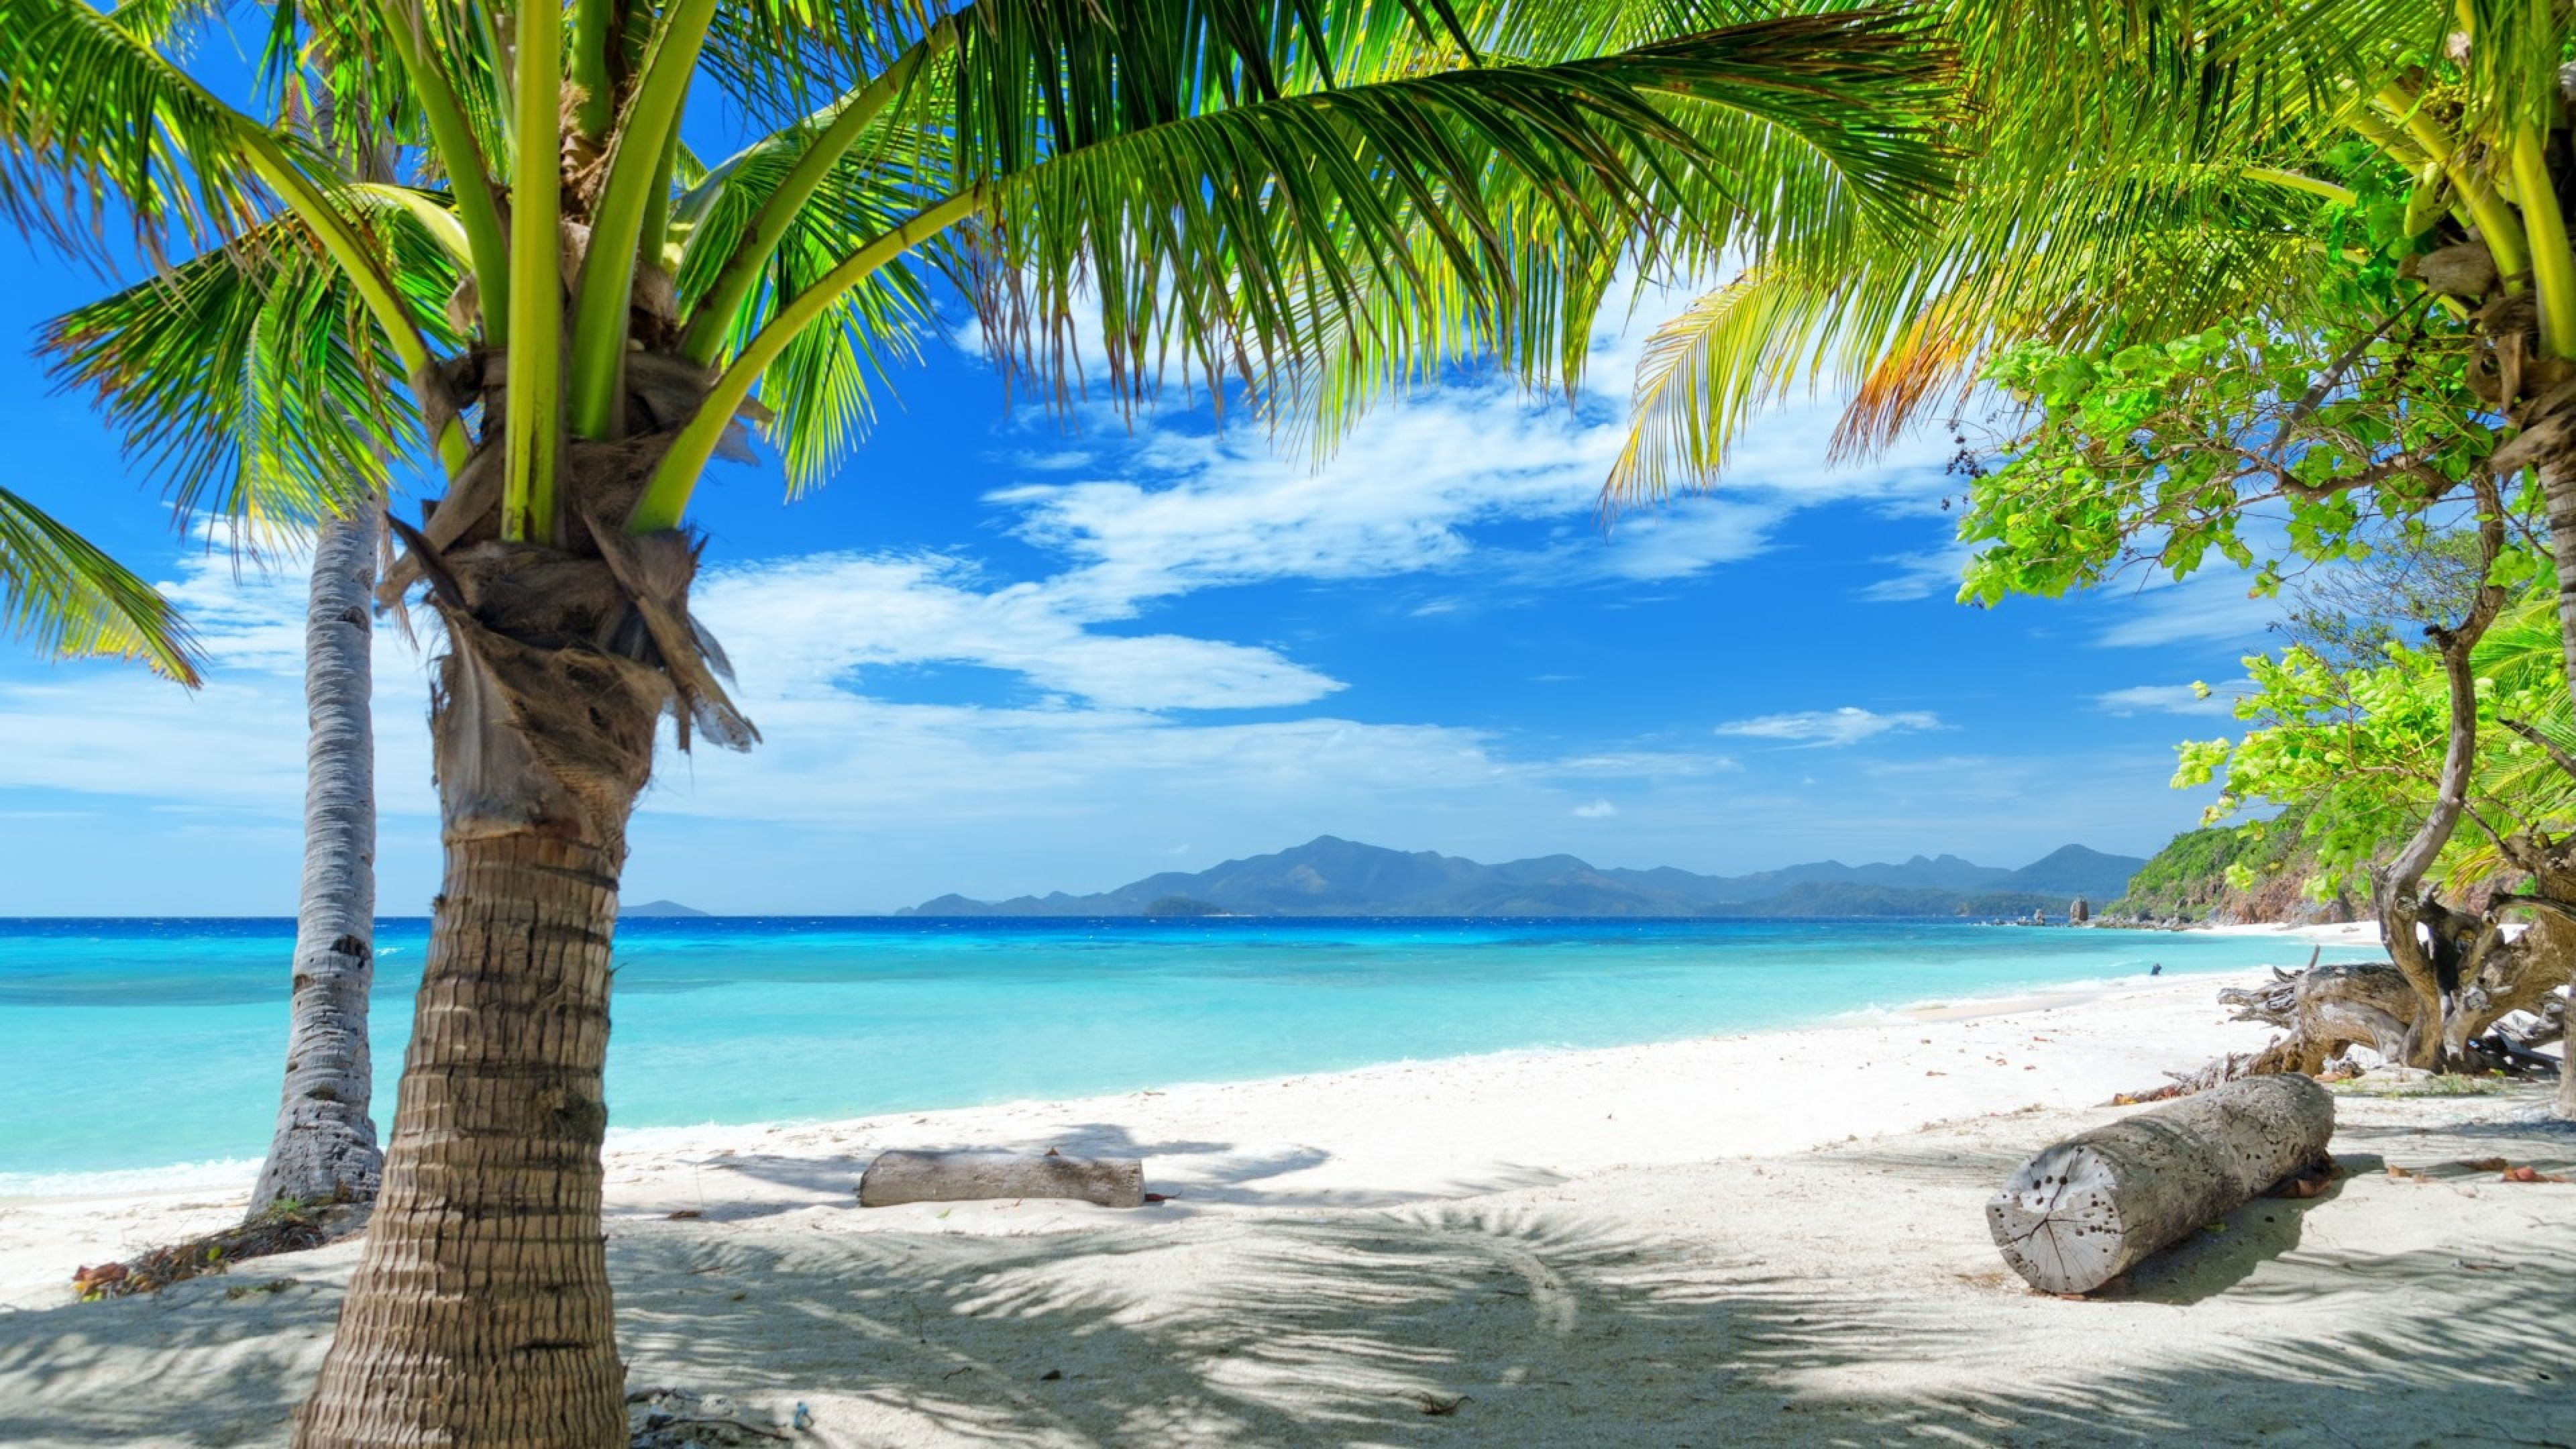 Custom Mural Wallpaper Hd Beautiful Sandy Beach Sea View: Palm Tree White Sand Beaches Wallpaper